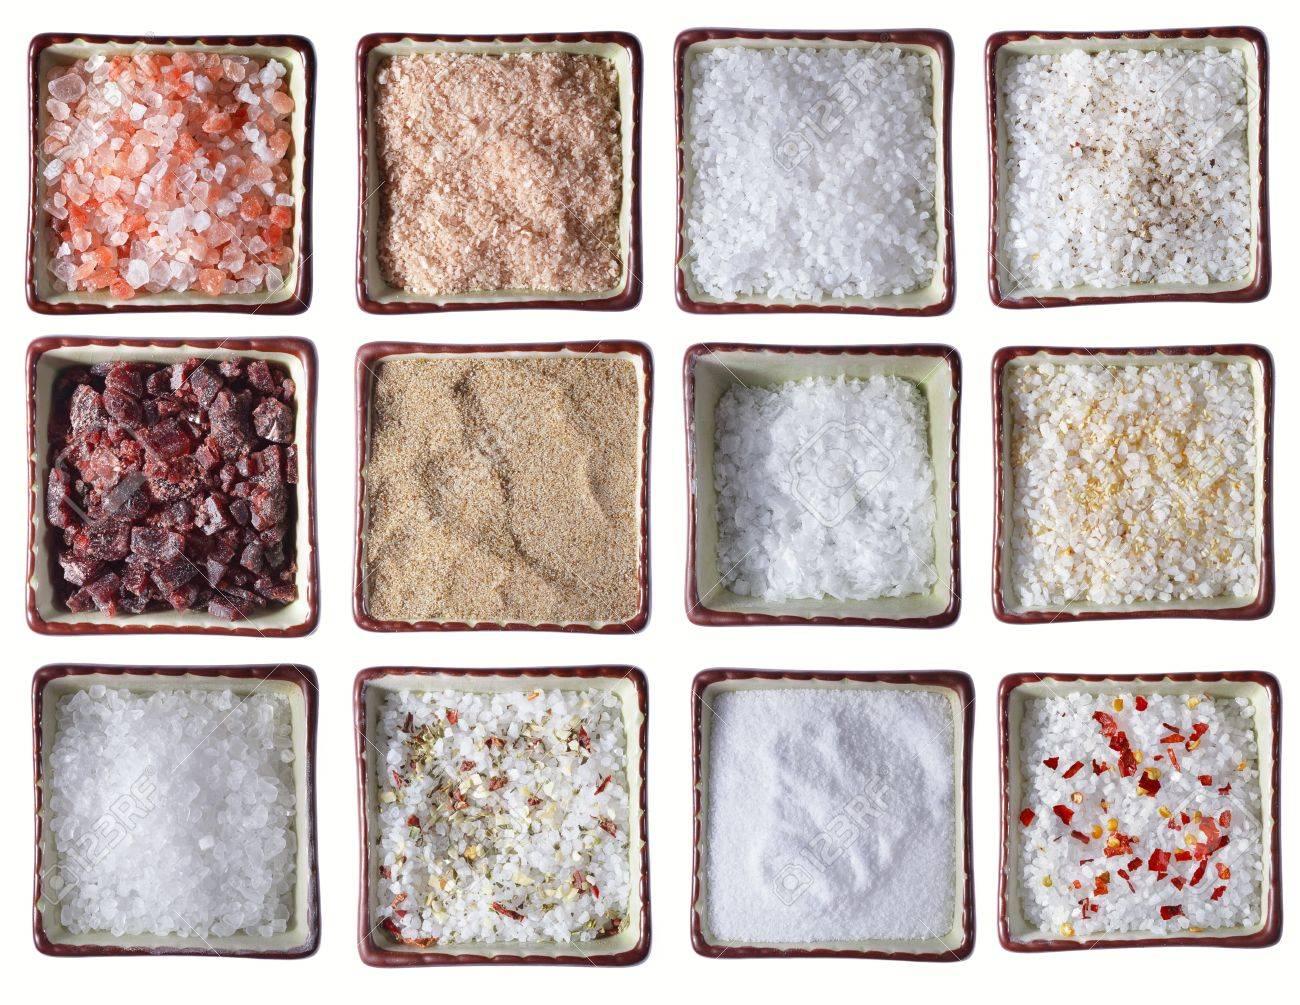 Salt Pepper: Twelve Types Of Sea Salt In Square Bowls, Over White